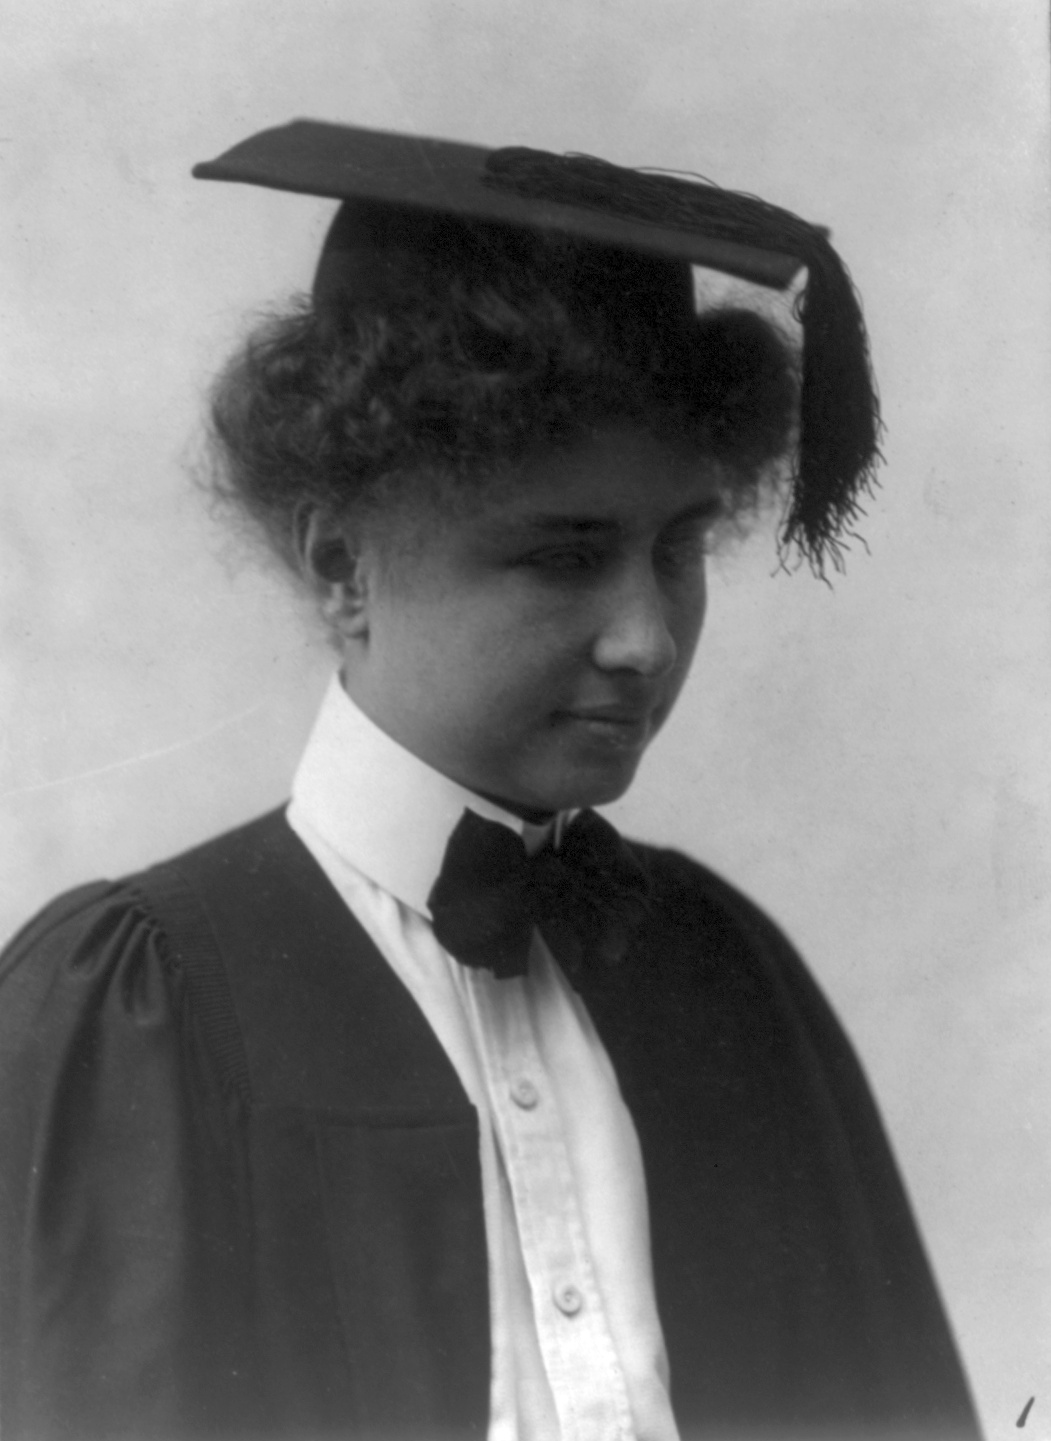 File:Helen Keller21.jpg - Wikimedia Commons